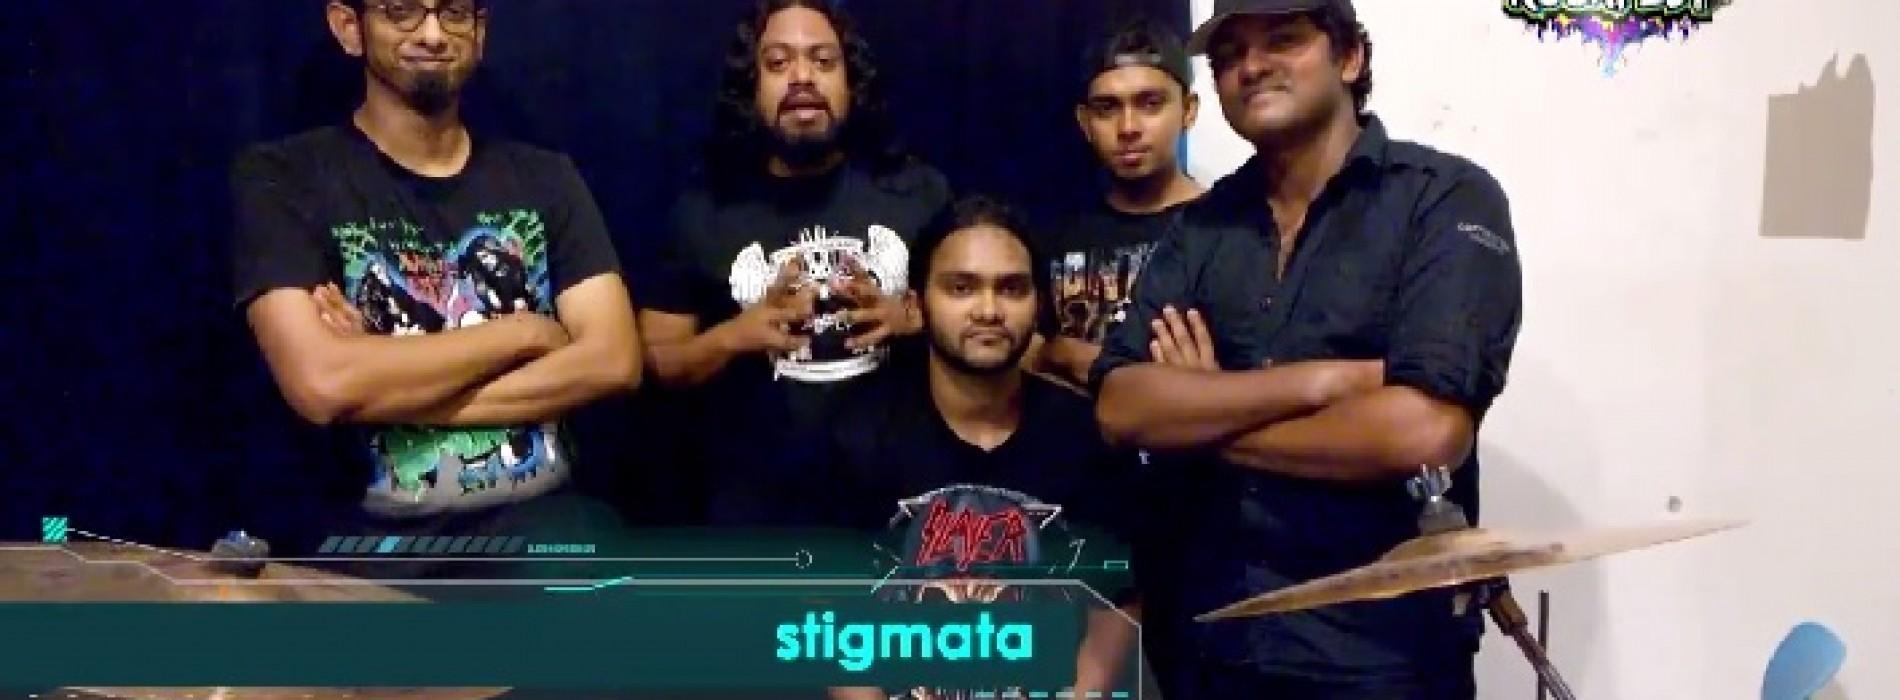 Stigmata @ The South Asian Rockfest